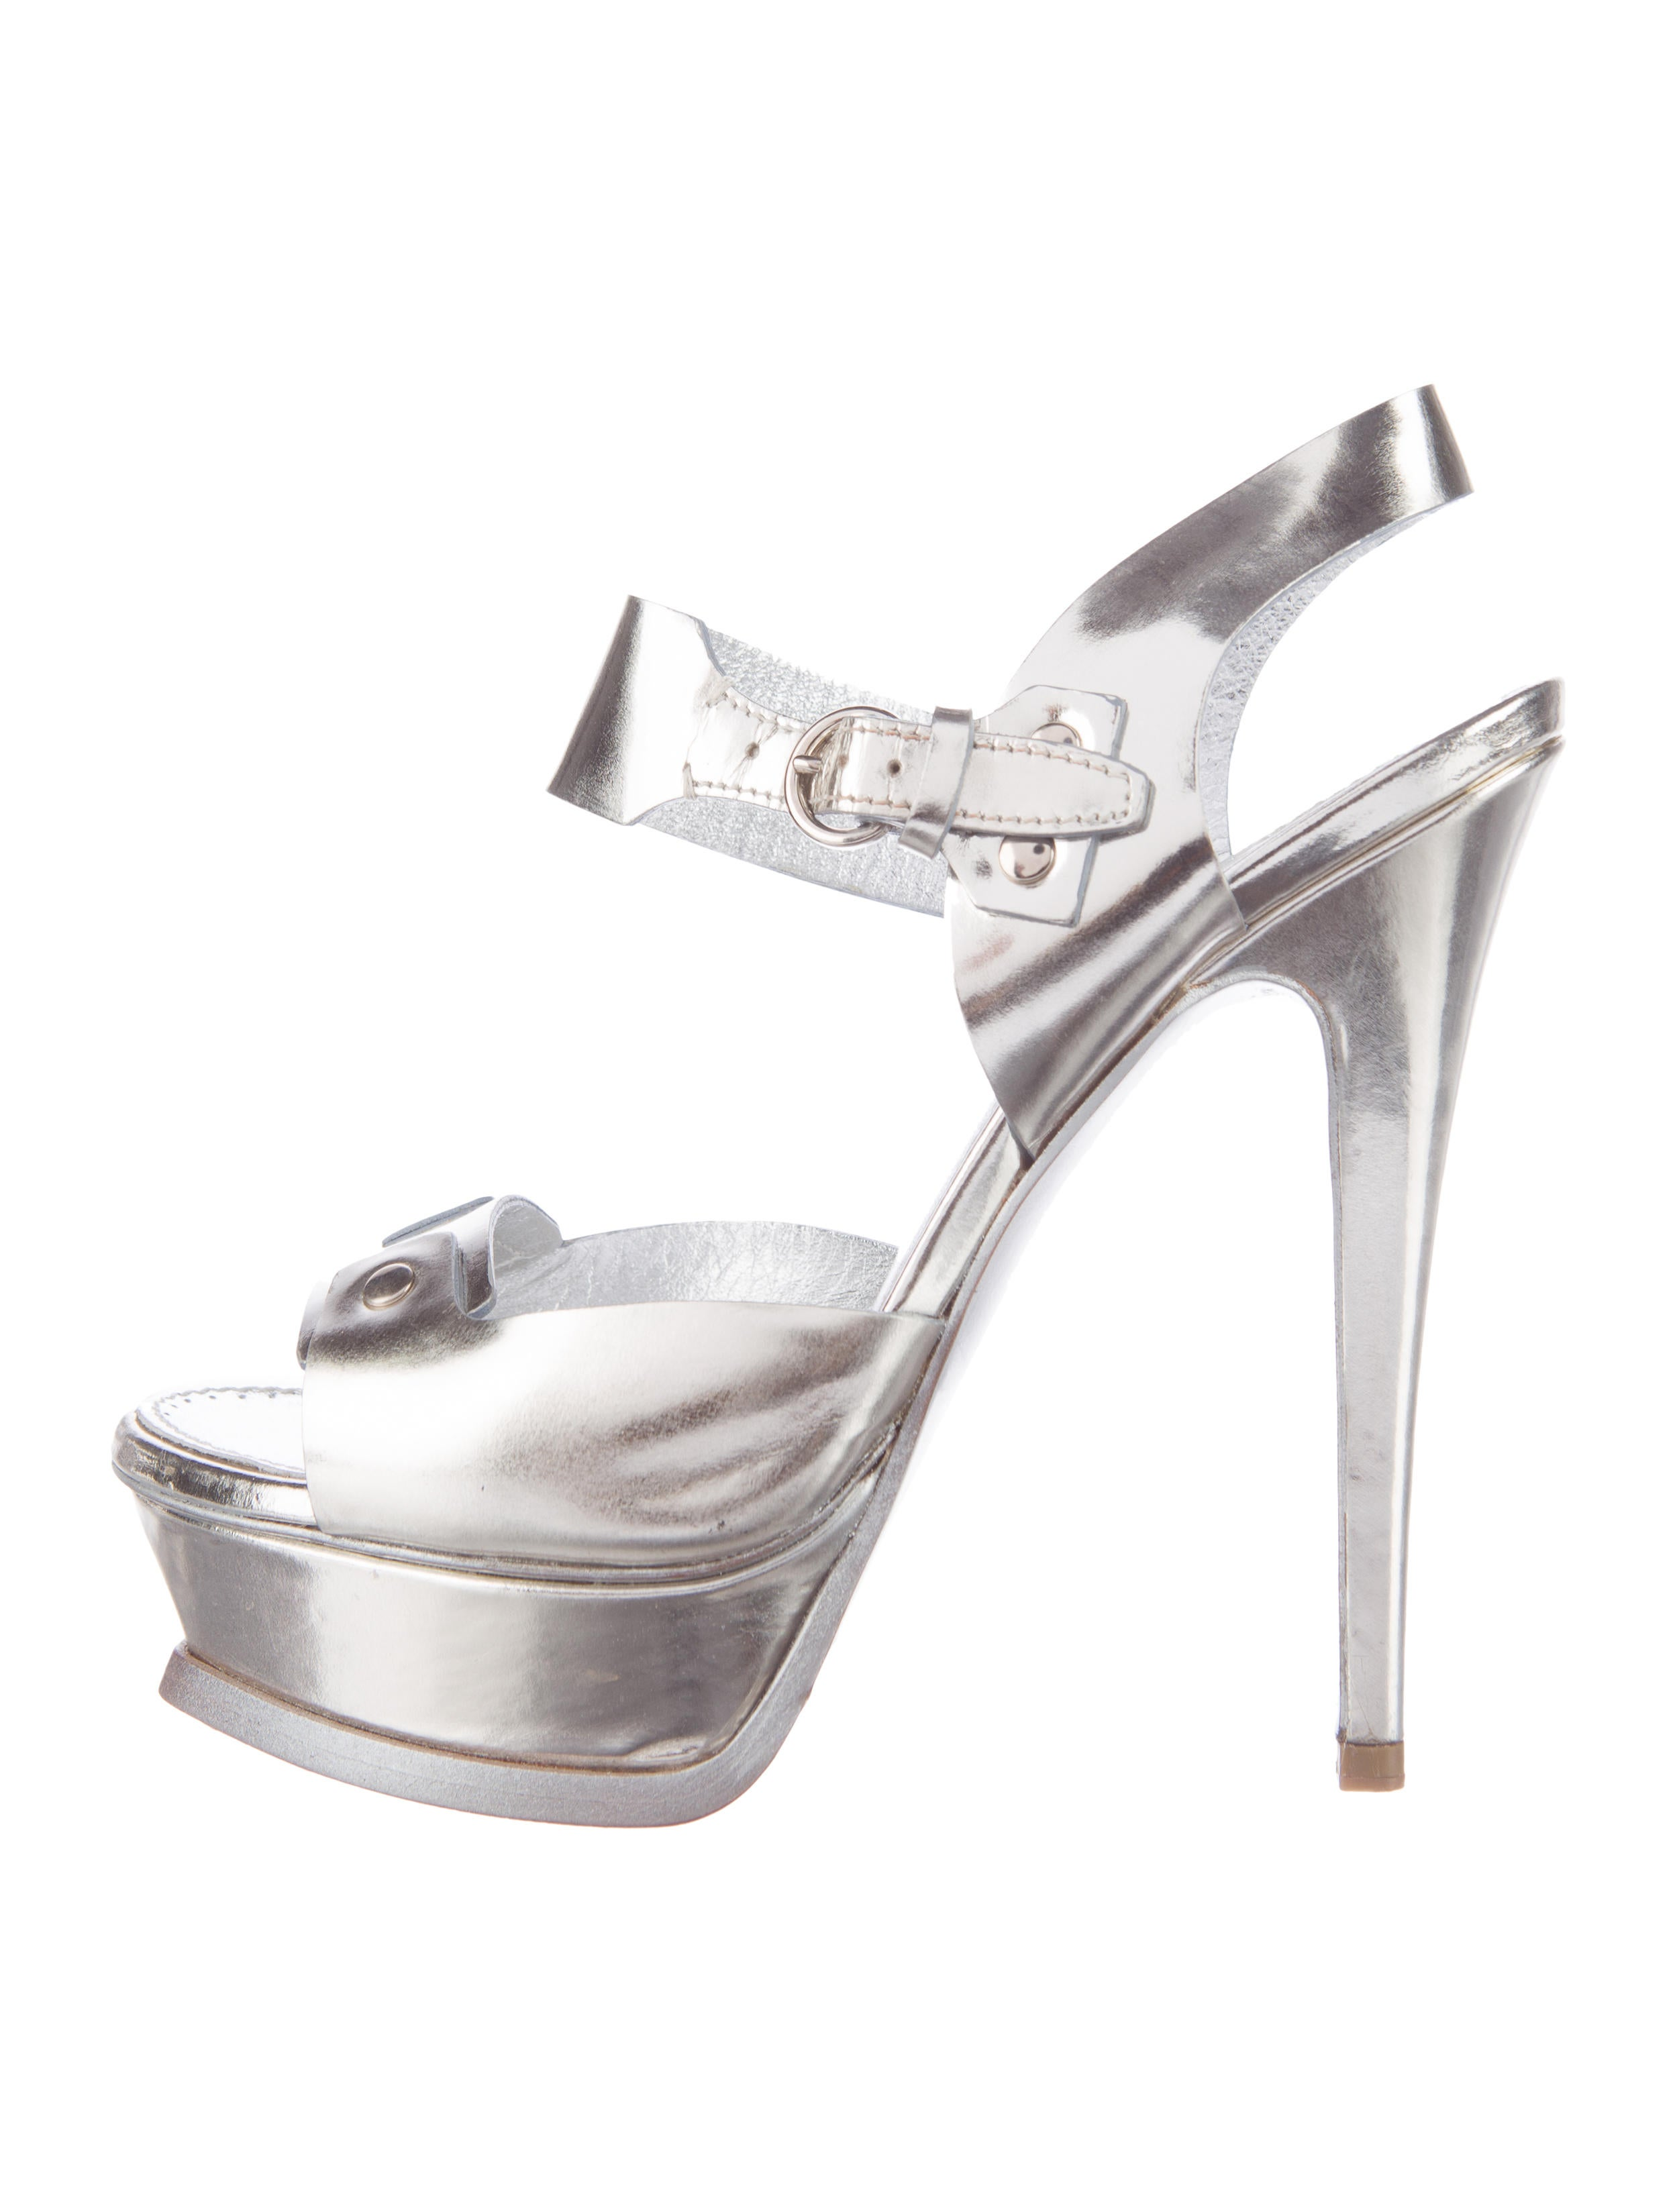 824cb9b9264 Yves Saint Laurent Stud 105 Metallic Sandals - Shoes - YVE59332 ...